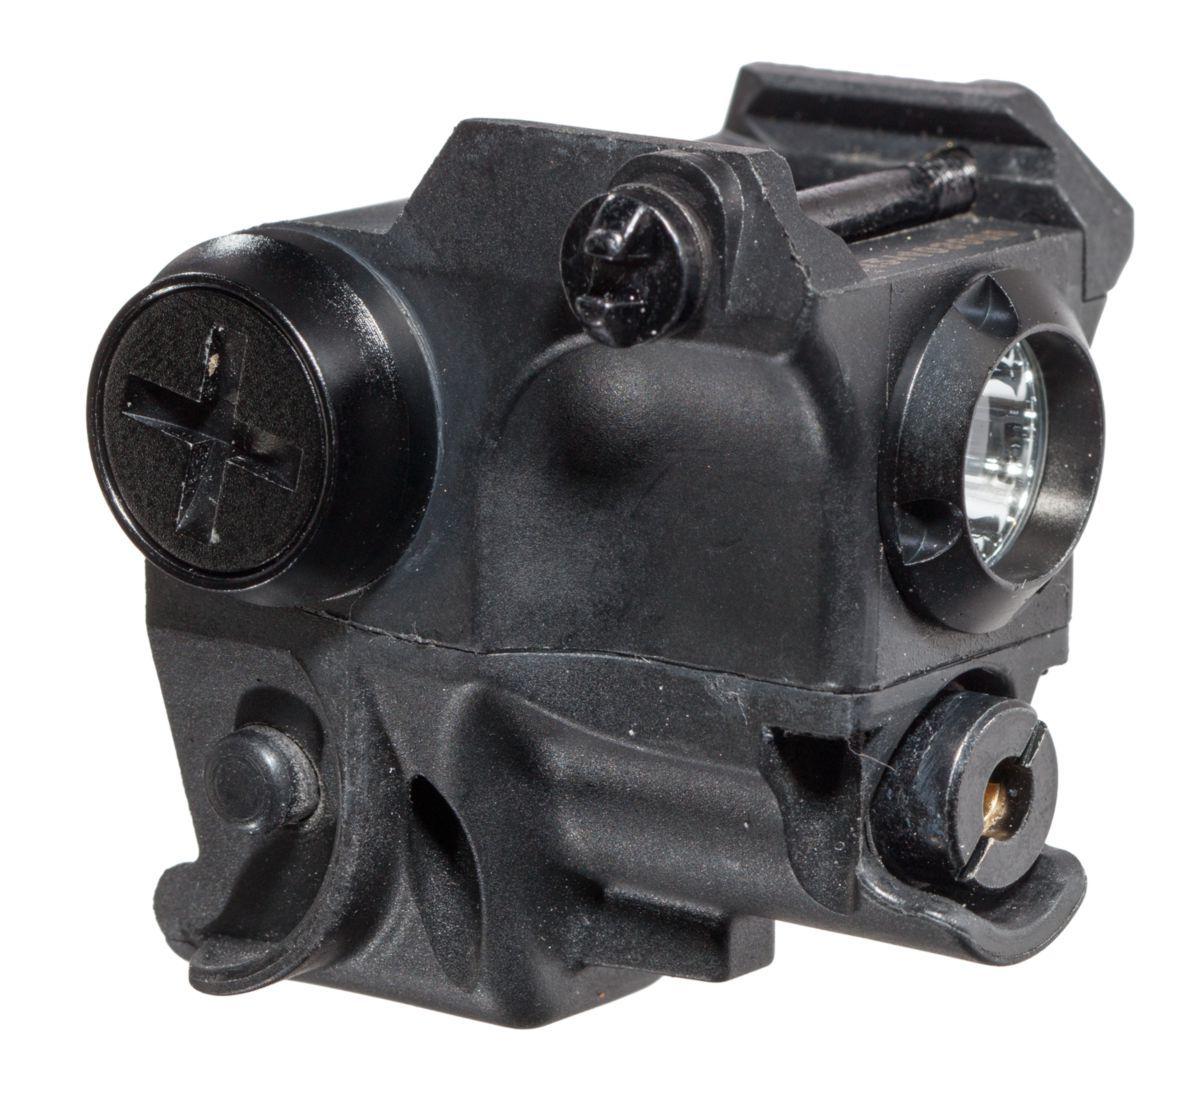 Pursuit® X1 Ultralight Rail Light/Laser Sight